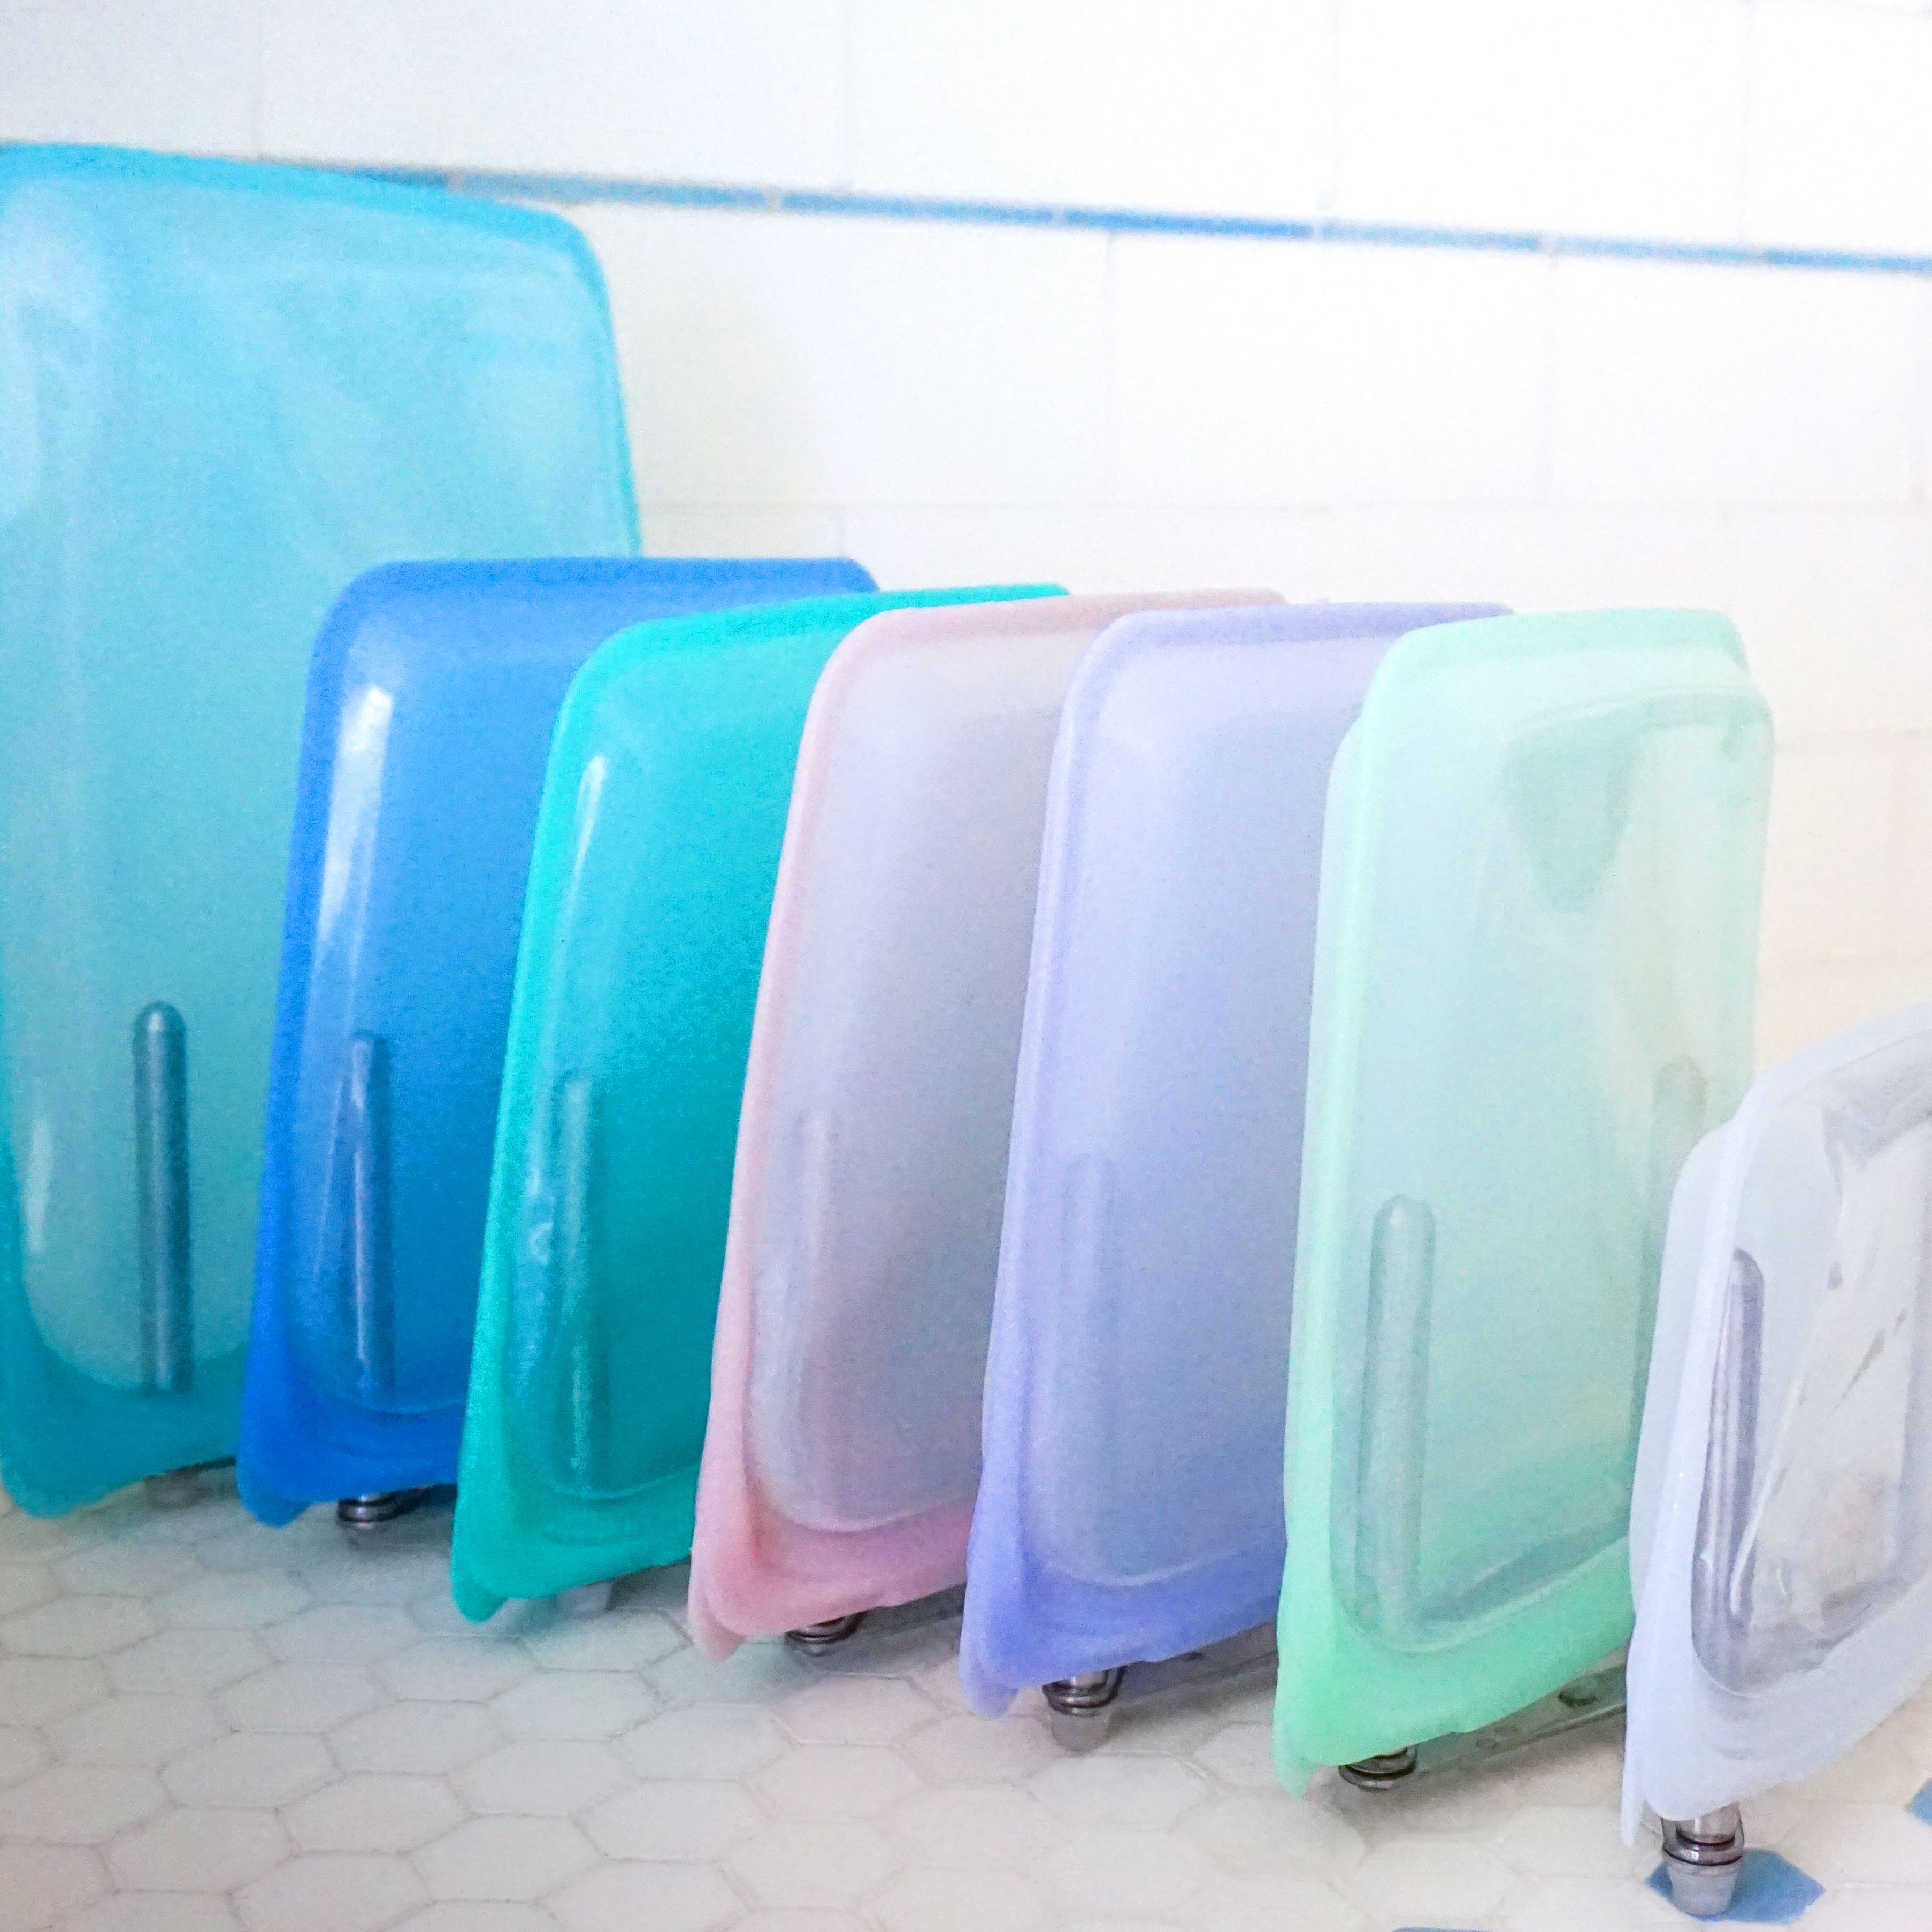 Reusable Silicone Bags By Stasher Stasher Eco Friendly Kitchen Reusable